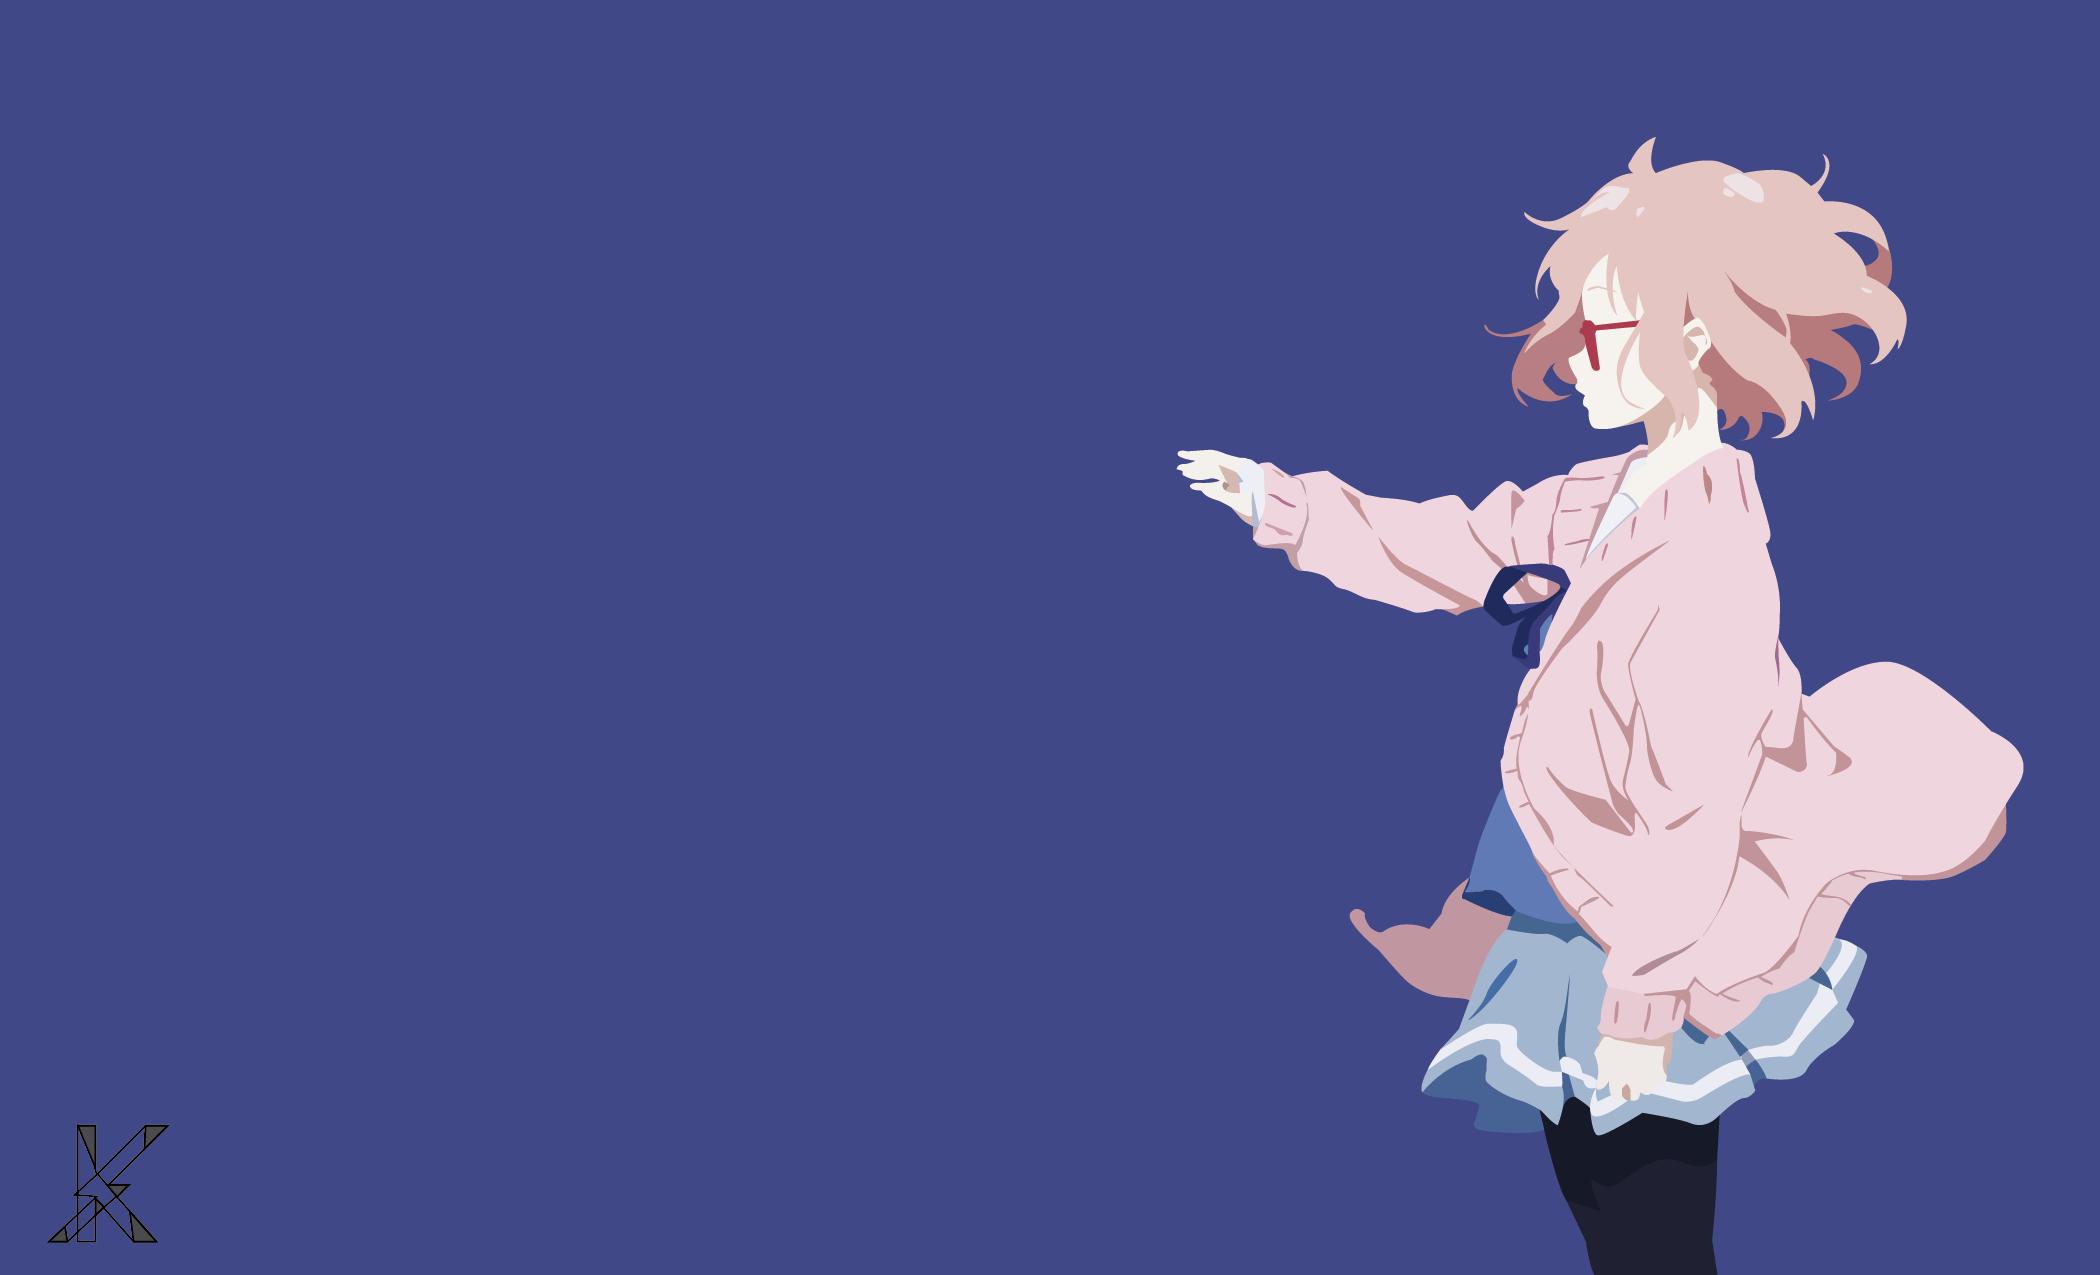 Wallpaper Illustration Anime Girls Cartoon Kyoukai No